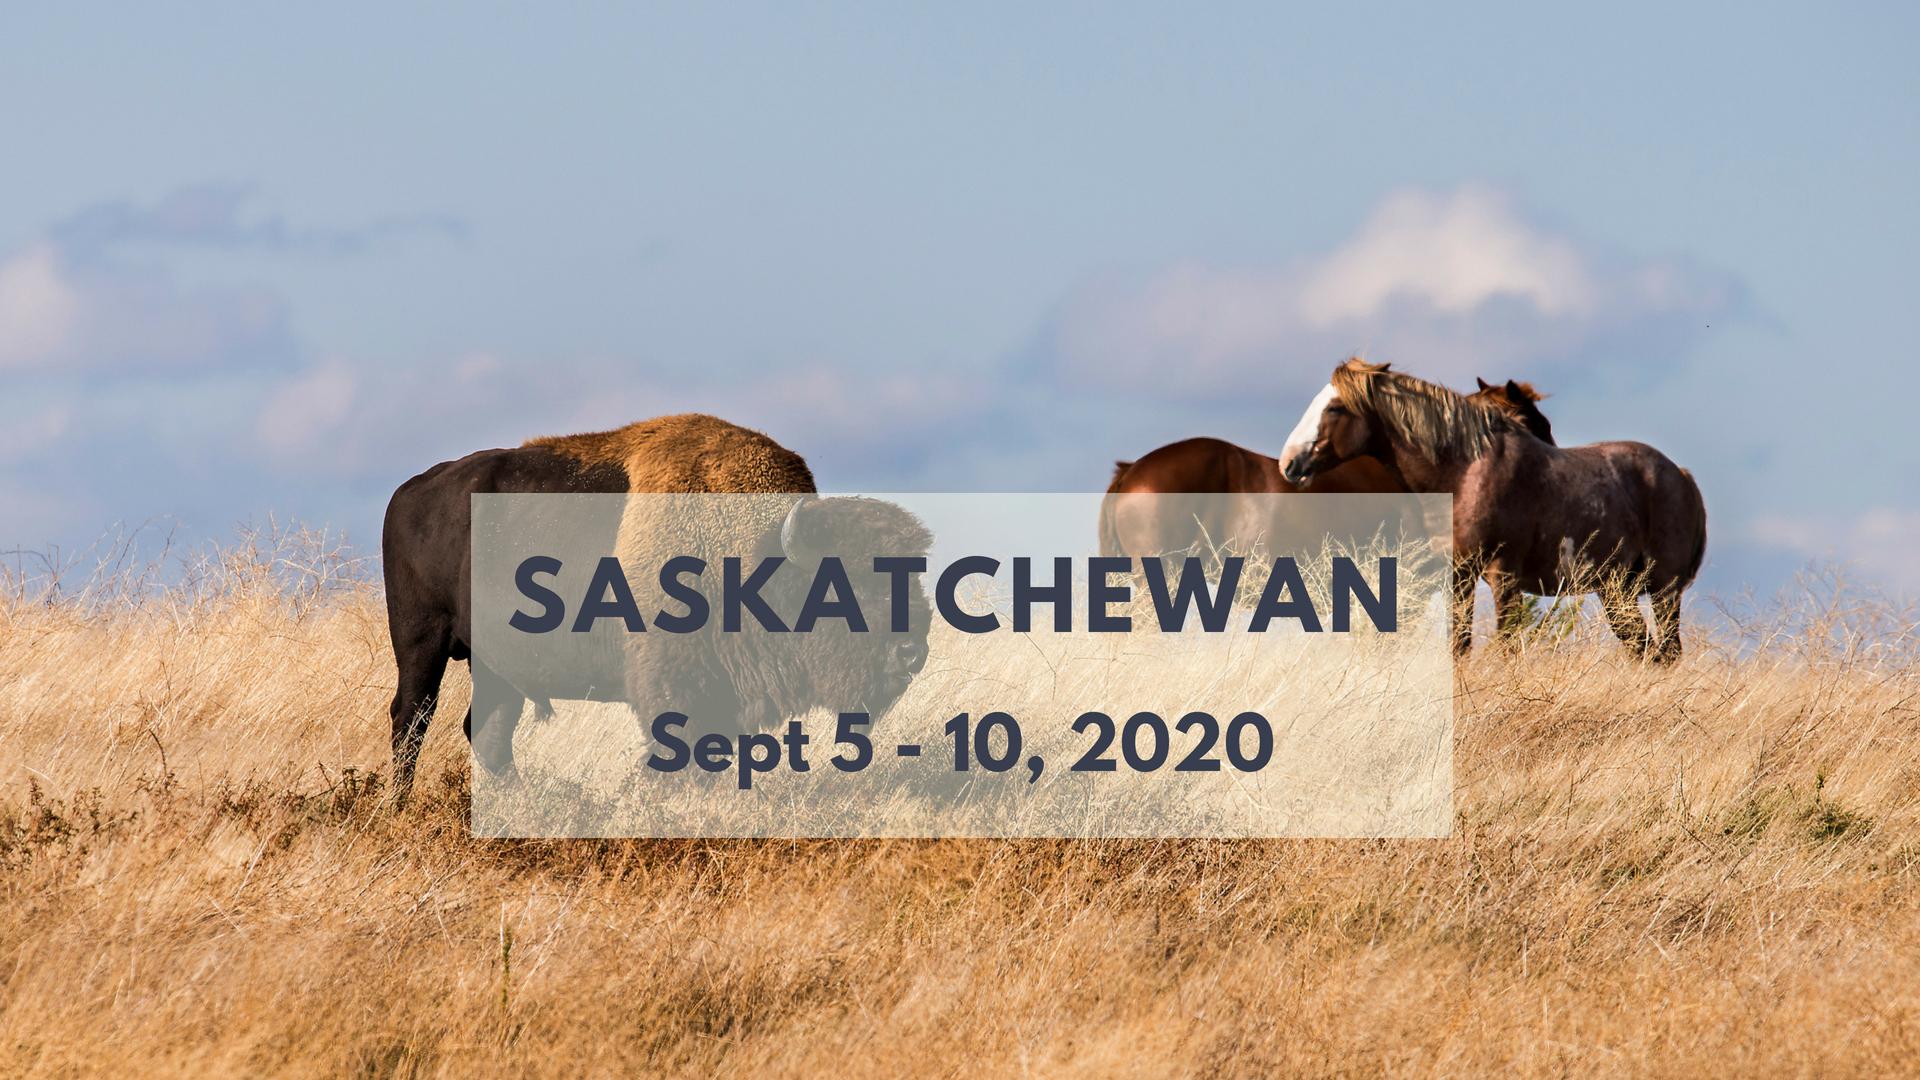 Saskatchewan Photography Workshop 2020